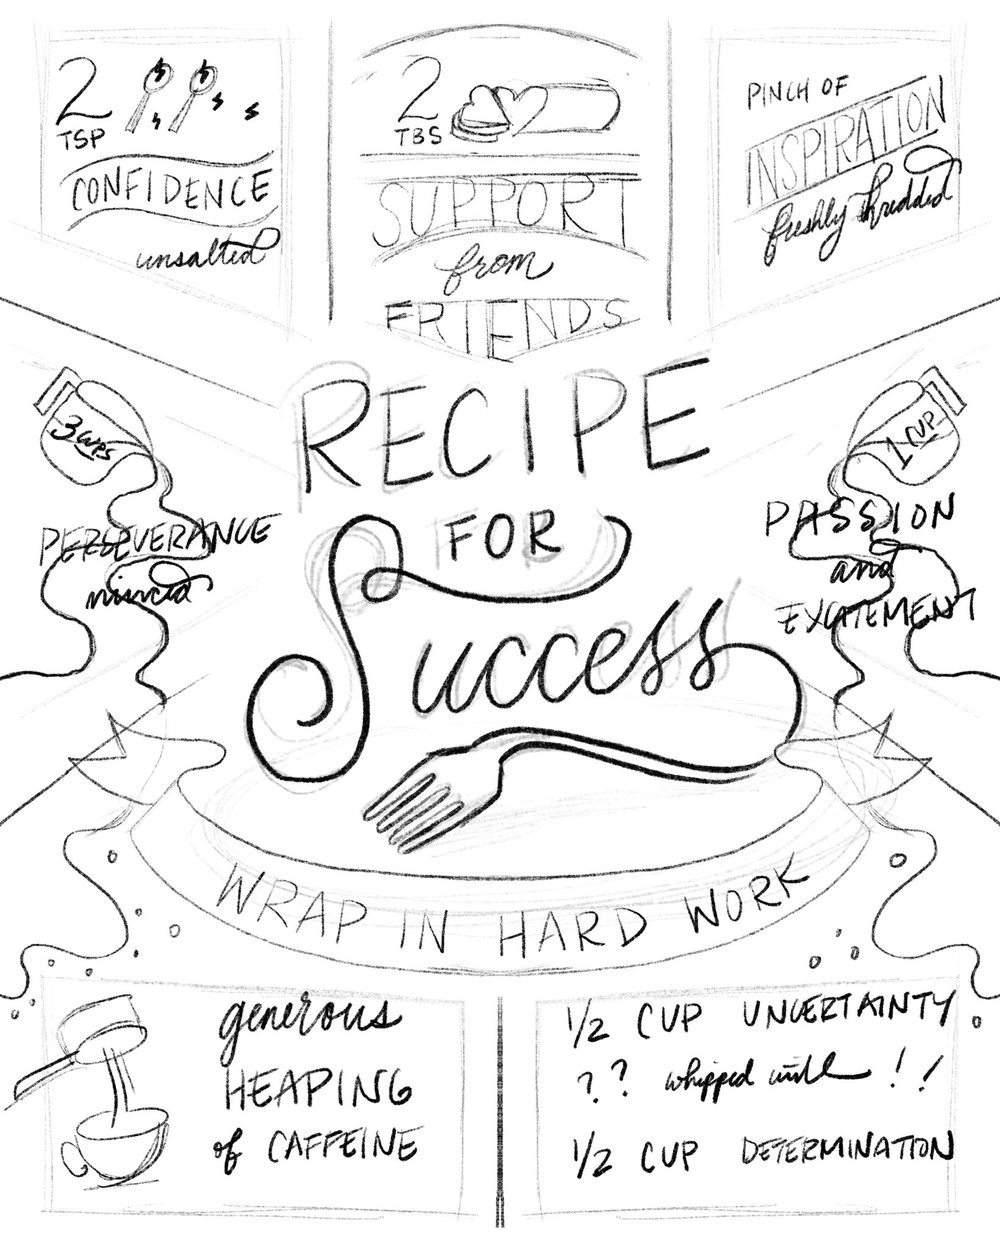 recipe-for-sucess-sketch.JPG